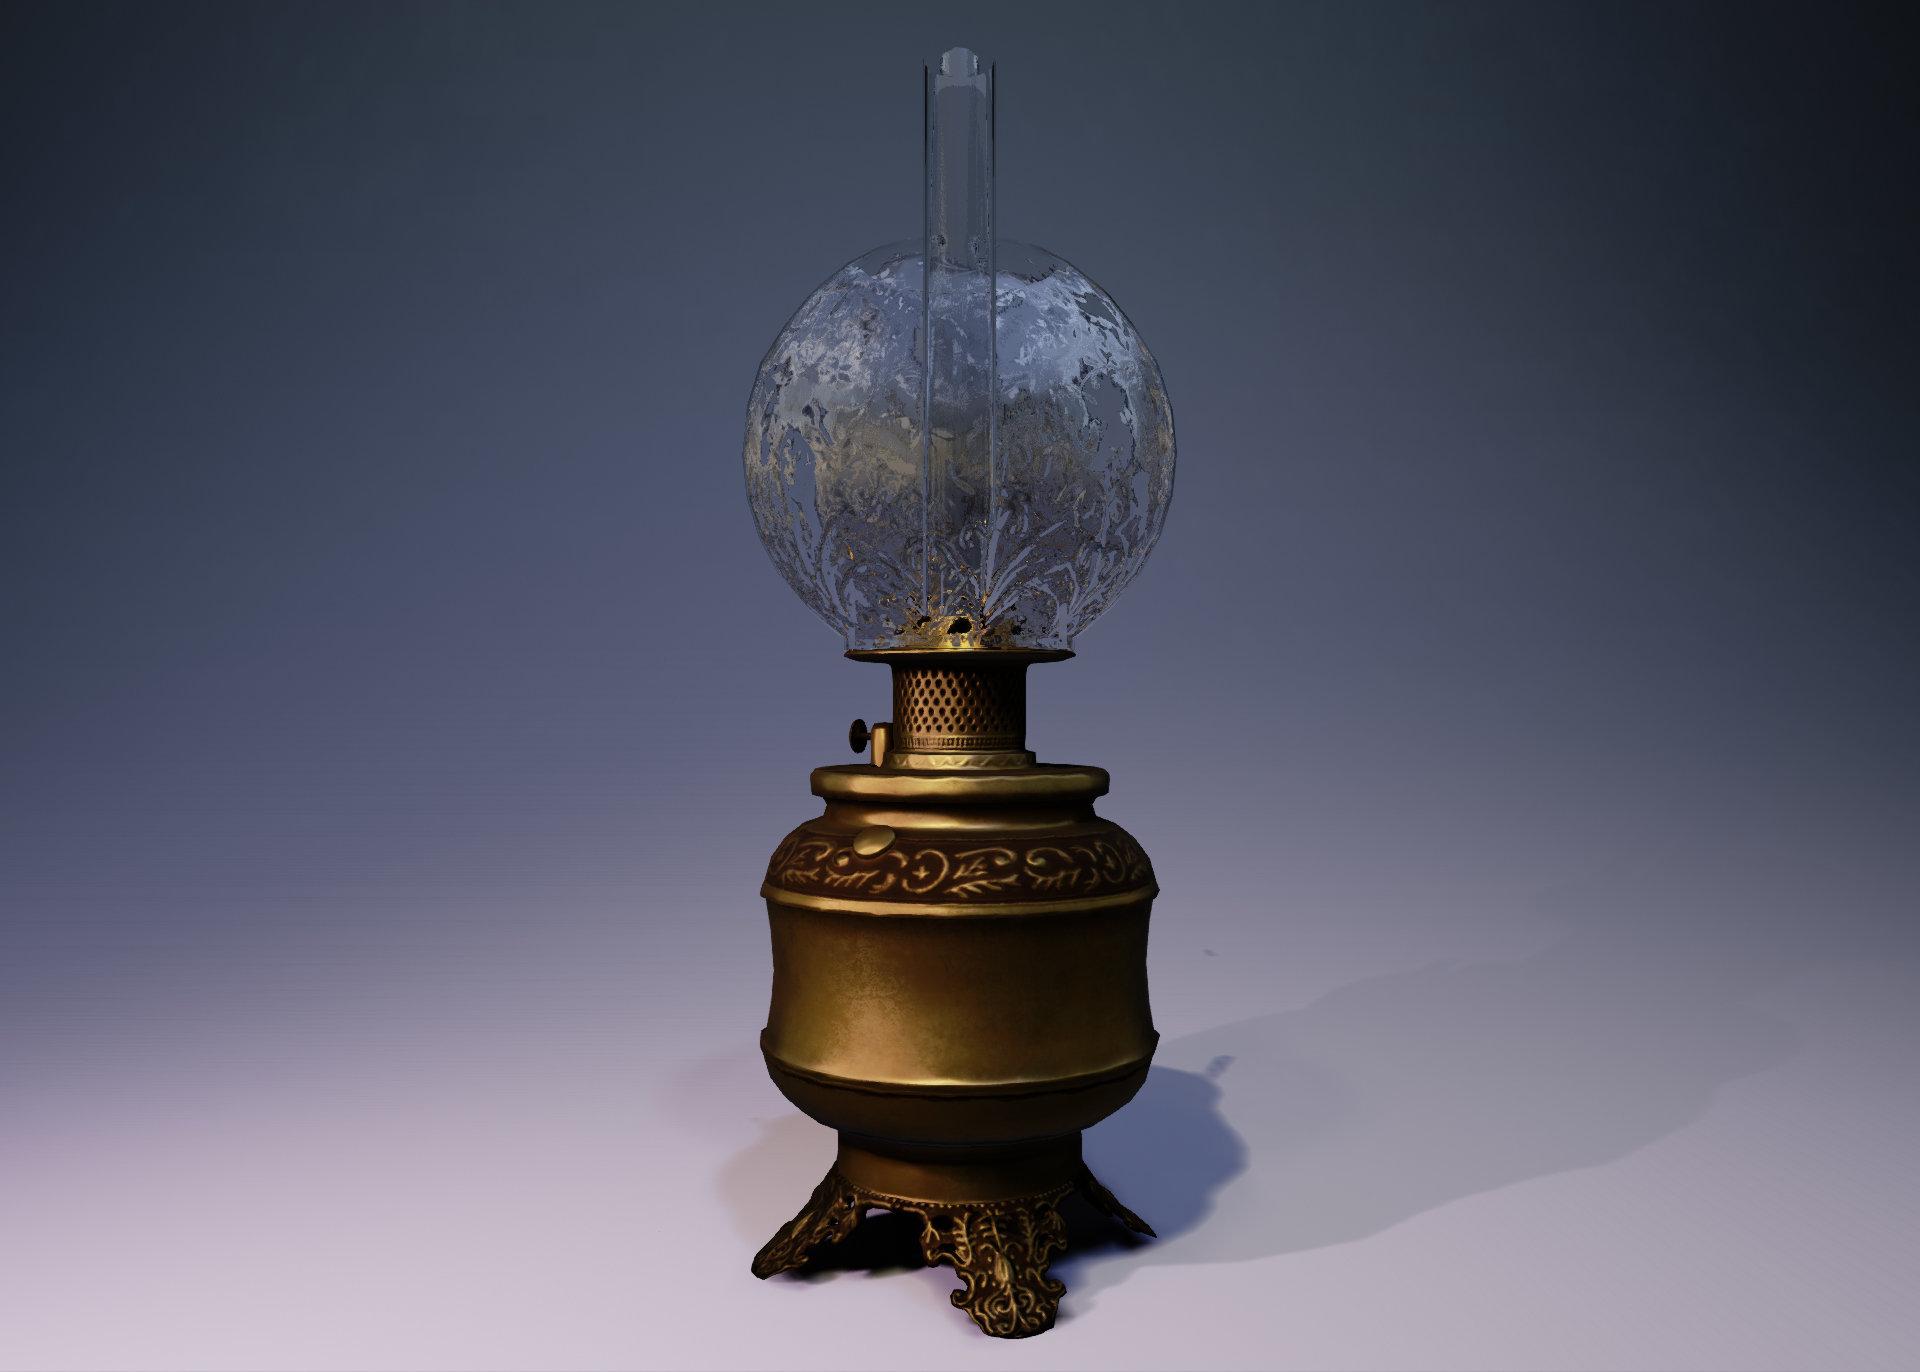 Samuel gauthier prop render oillampb